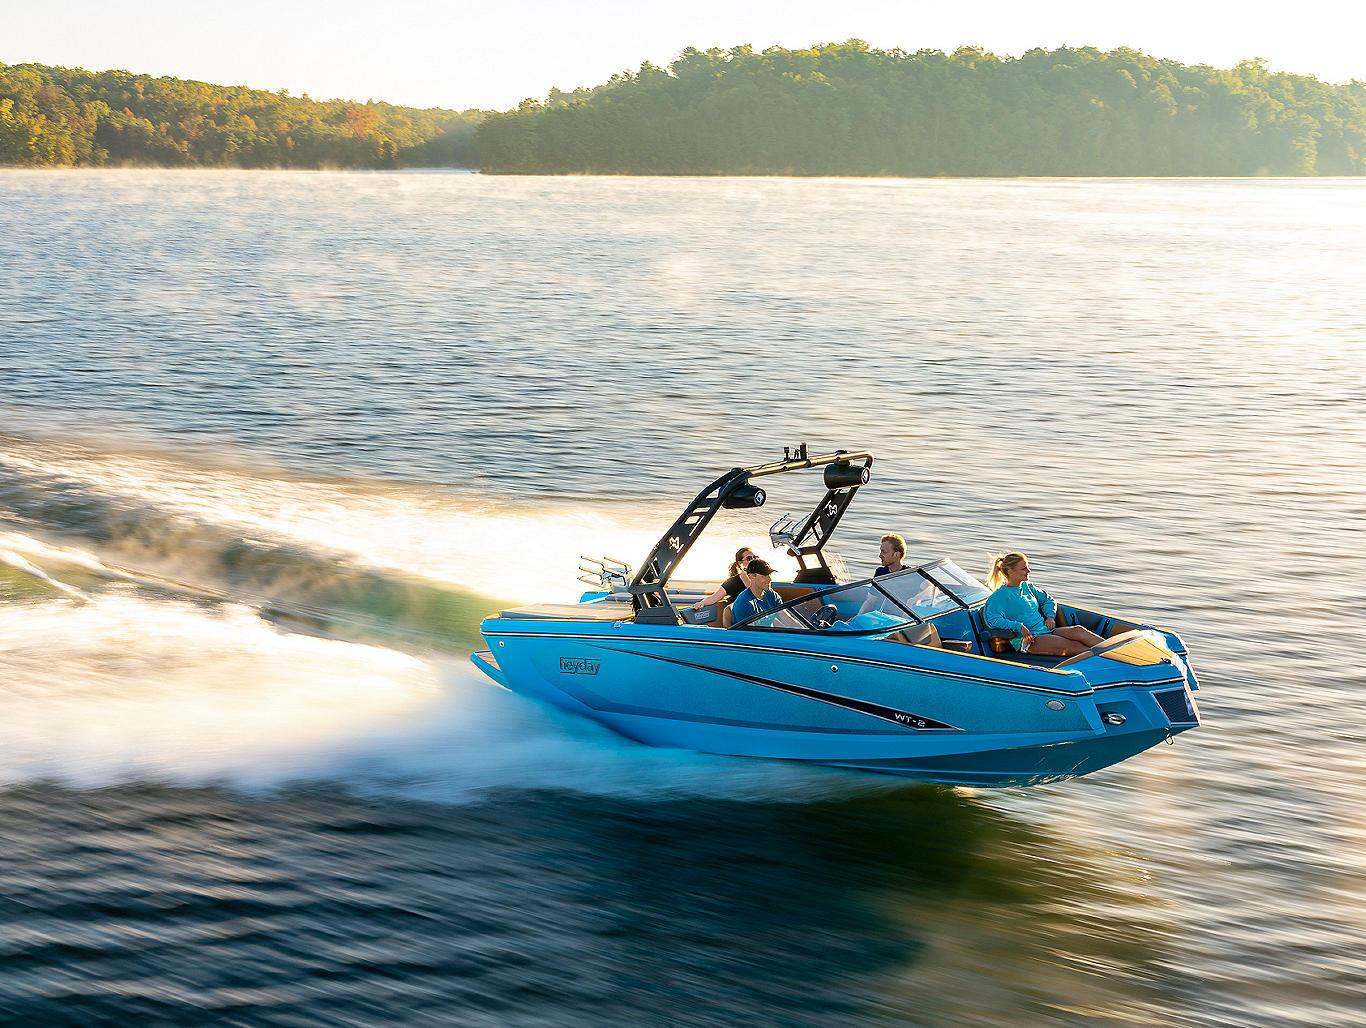 WT2-BlueBoat-Running